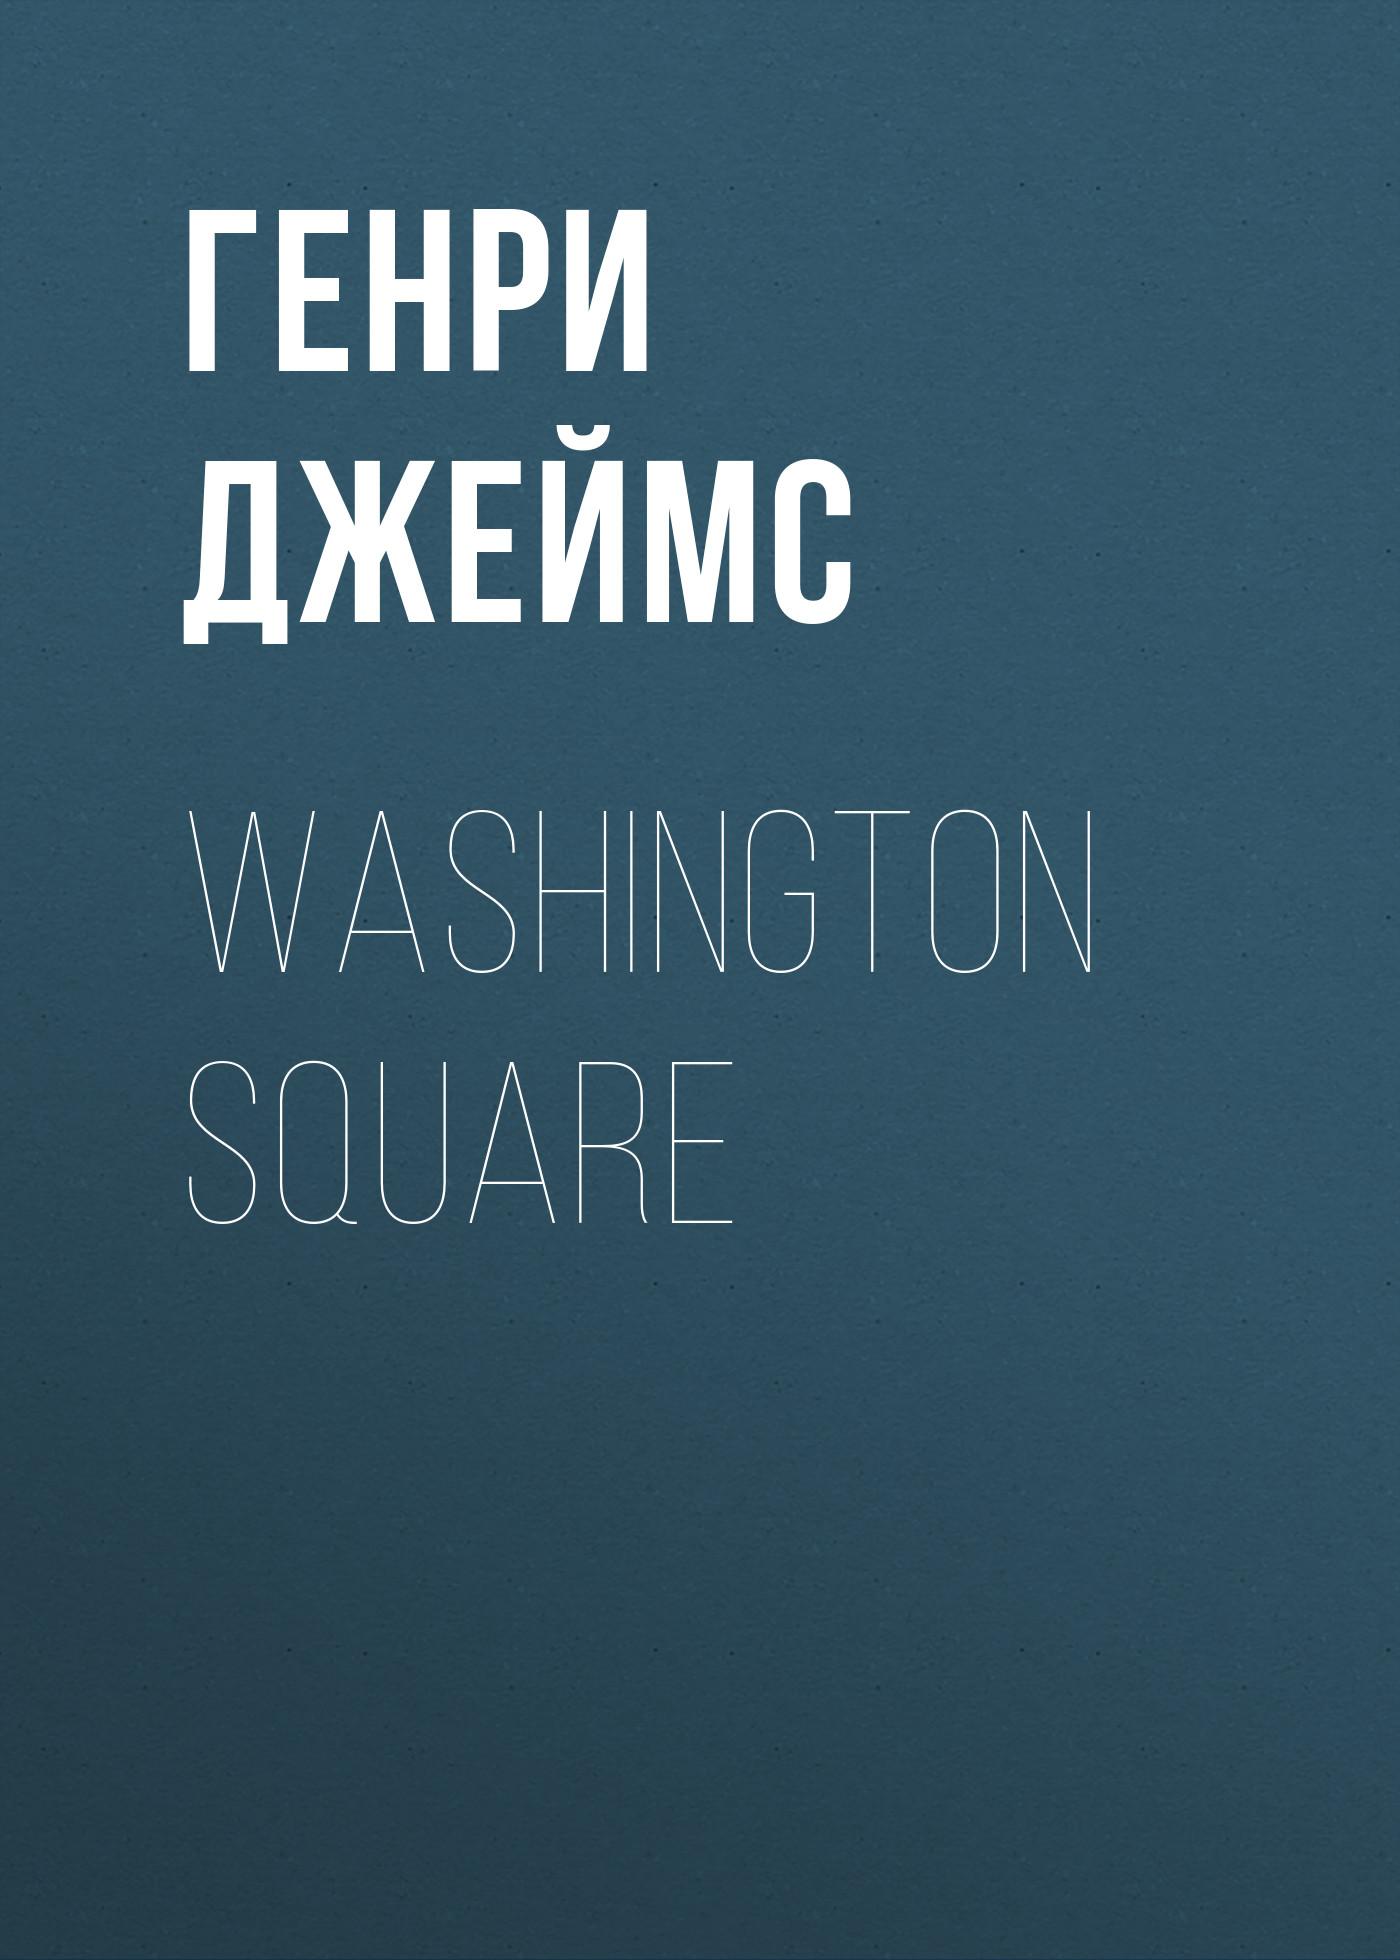 Генри Джеймс Washington Square murder on washington square